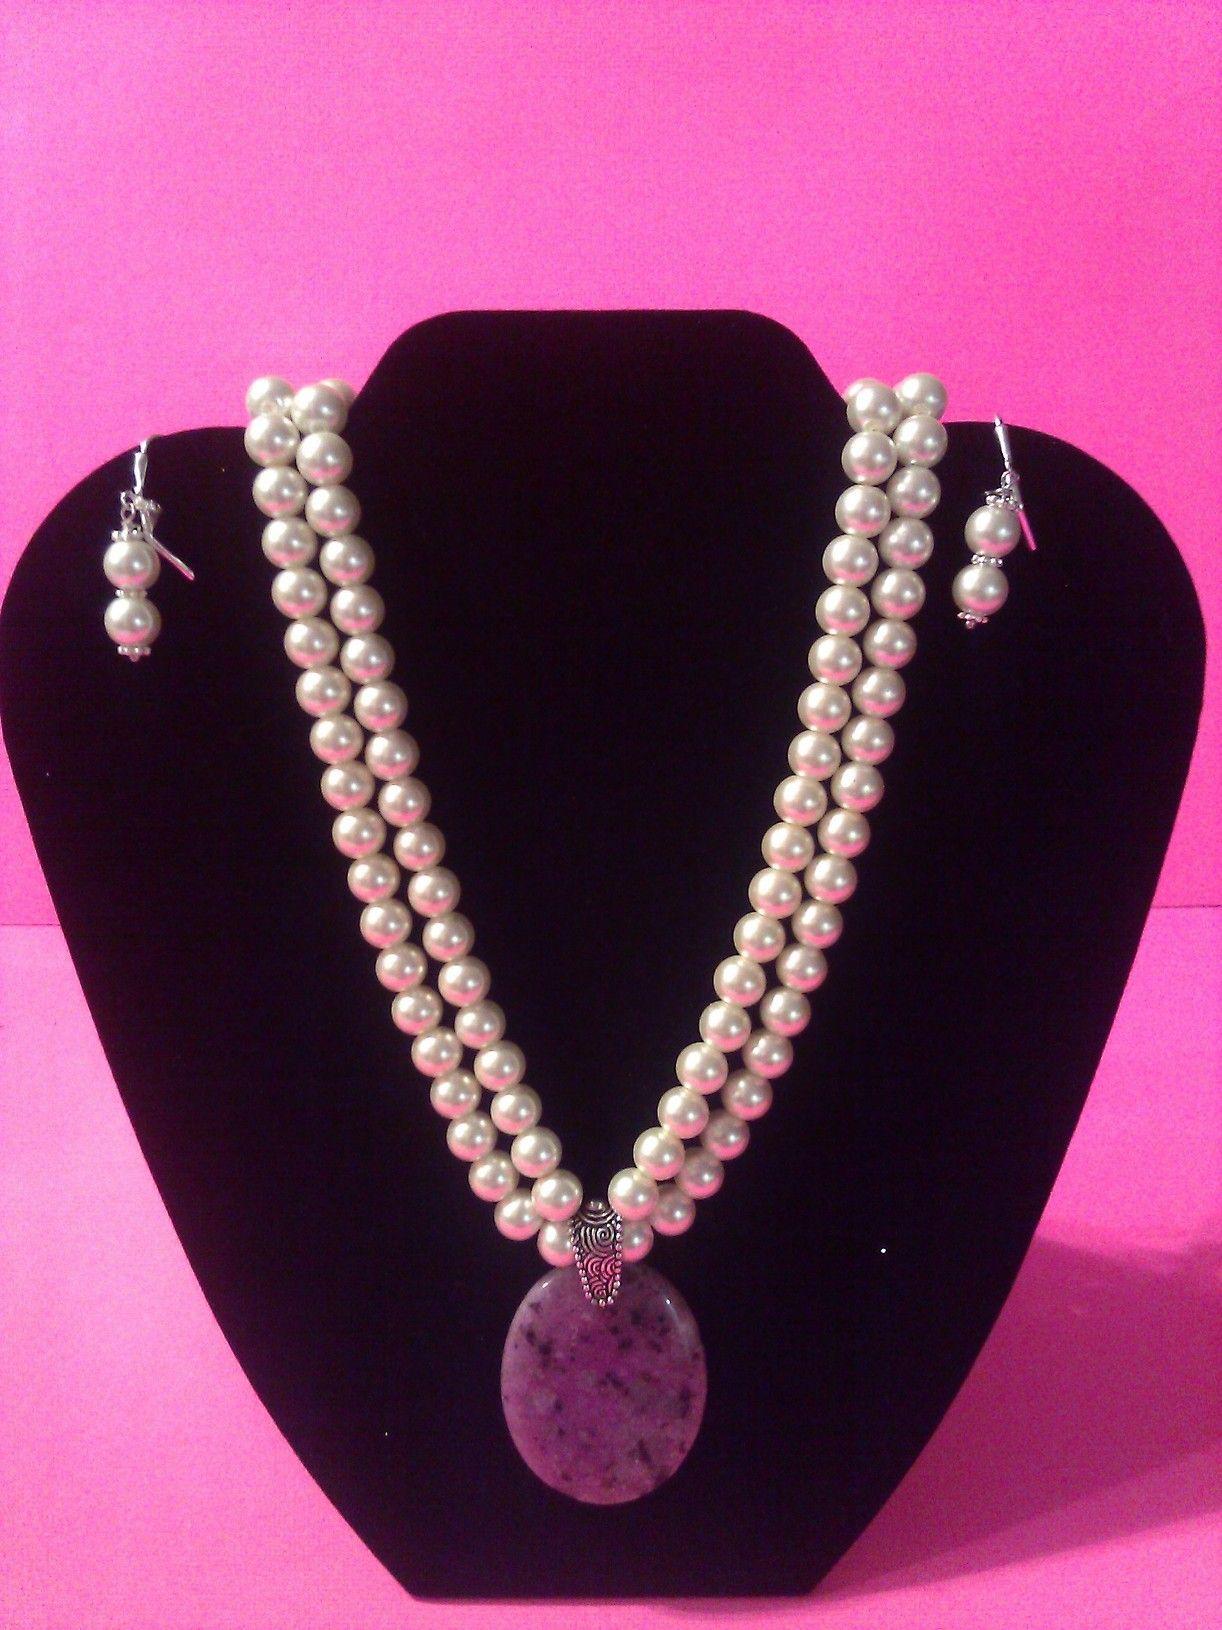 Jewish nose piercing  Perlas  Blessed Jewelry  Pinterest